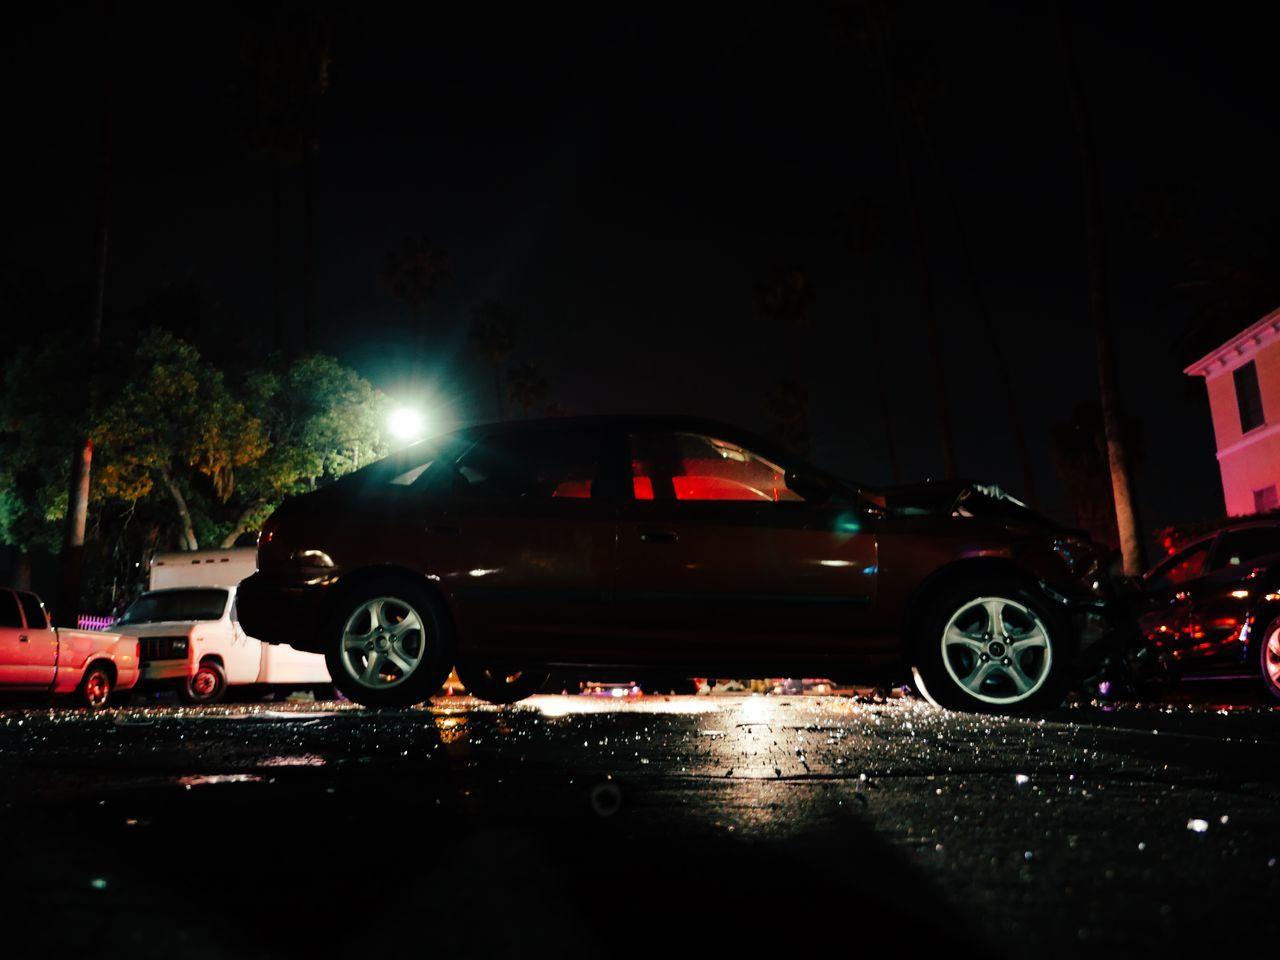 night, illuminated, transportation, car, land vehicle, wet, mode of transport, no people, road, outdoors